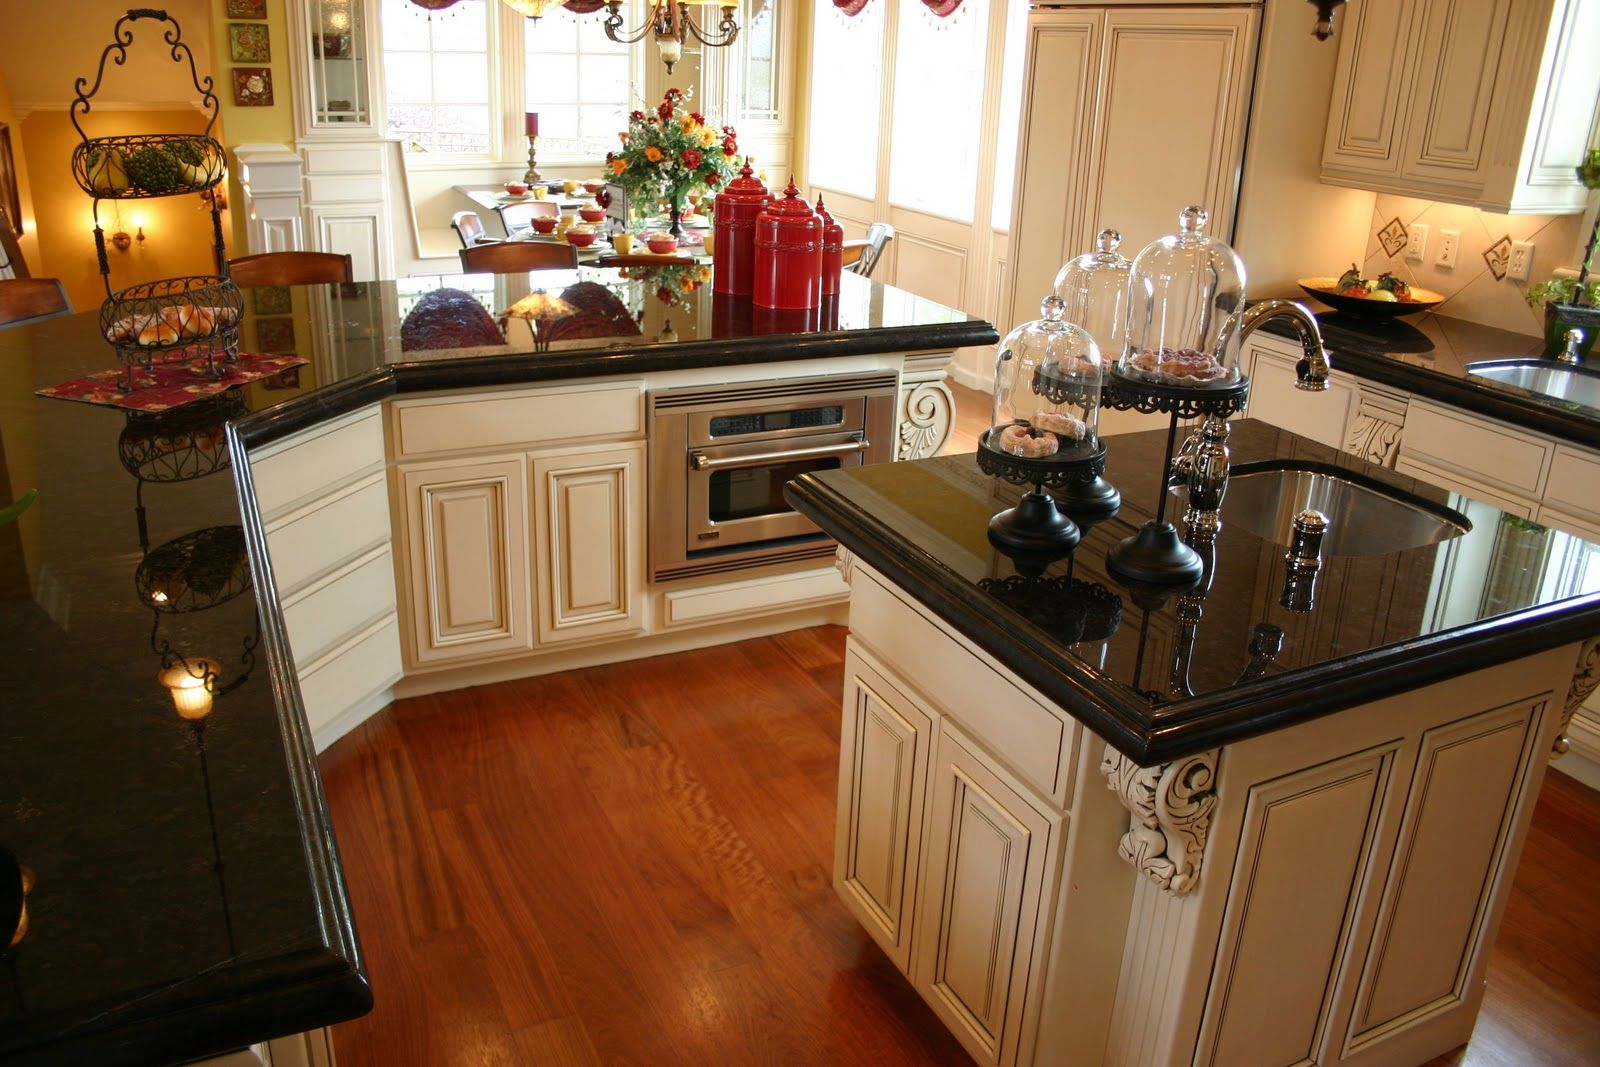 The Granite Gurus Absolute Black Granite Kitchen Black Granite Countertops Black Granite Kitchen Cream Kitchen Cabinets